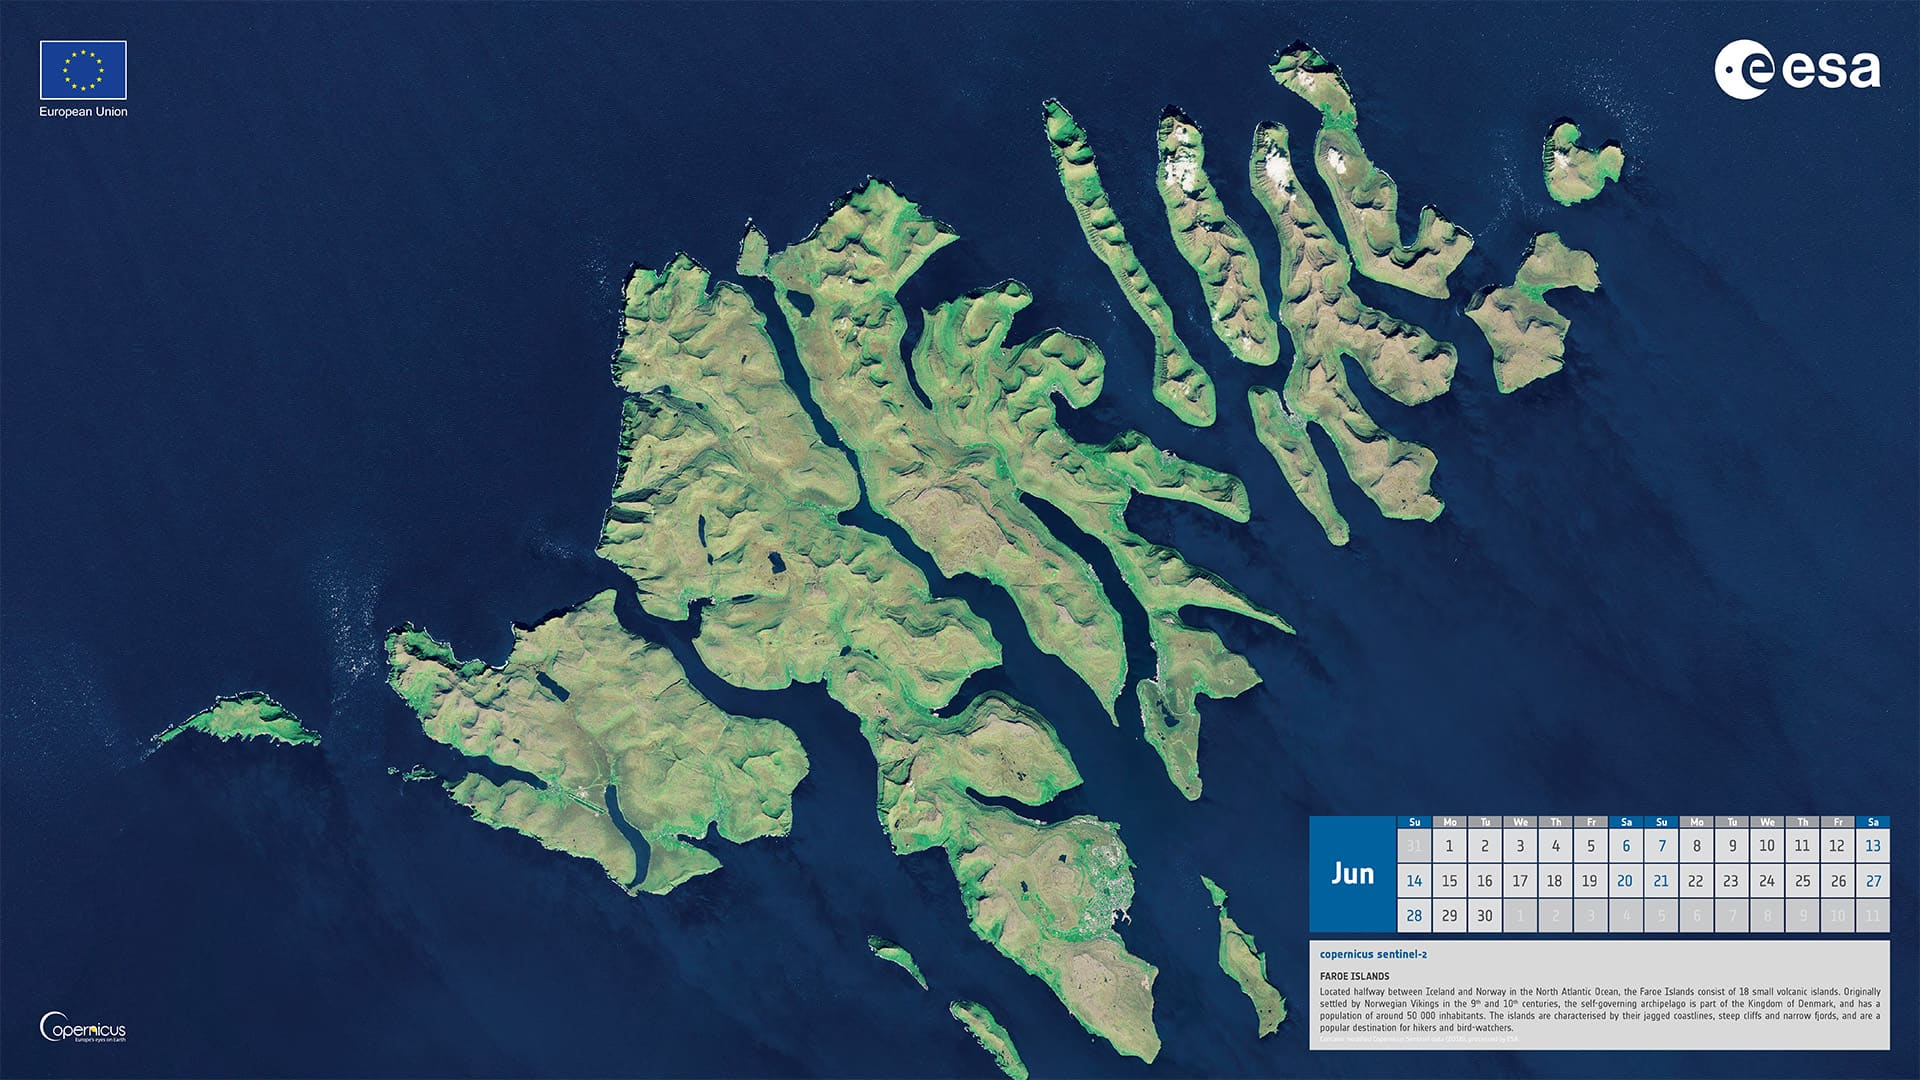 Juin 2020 - Îles Féroé (Danemark)